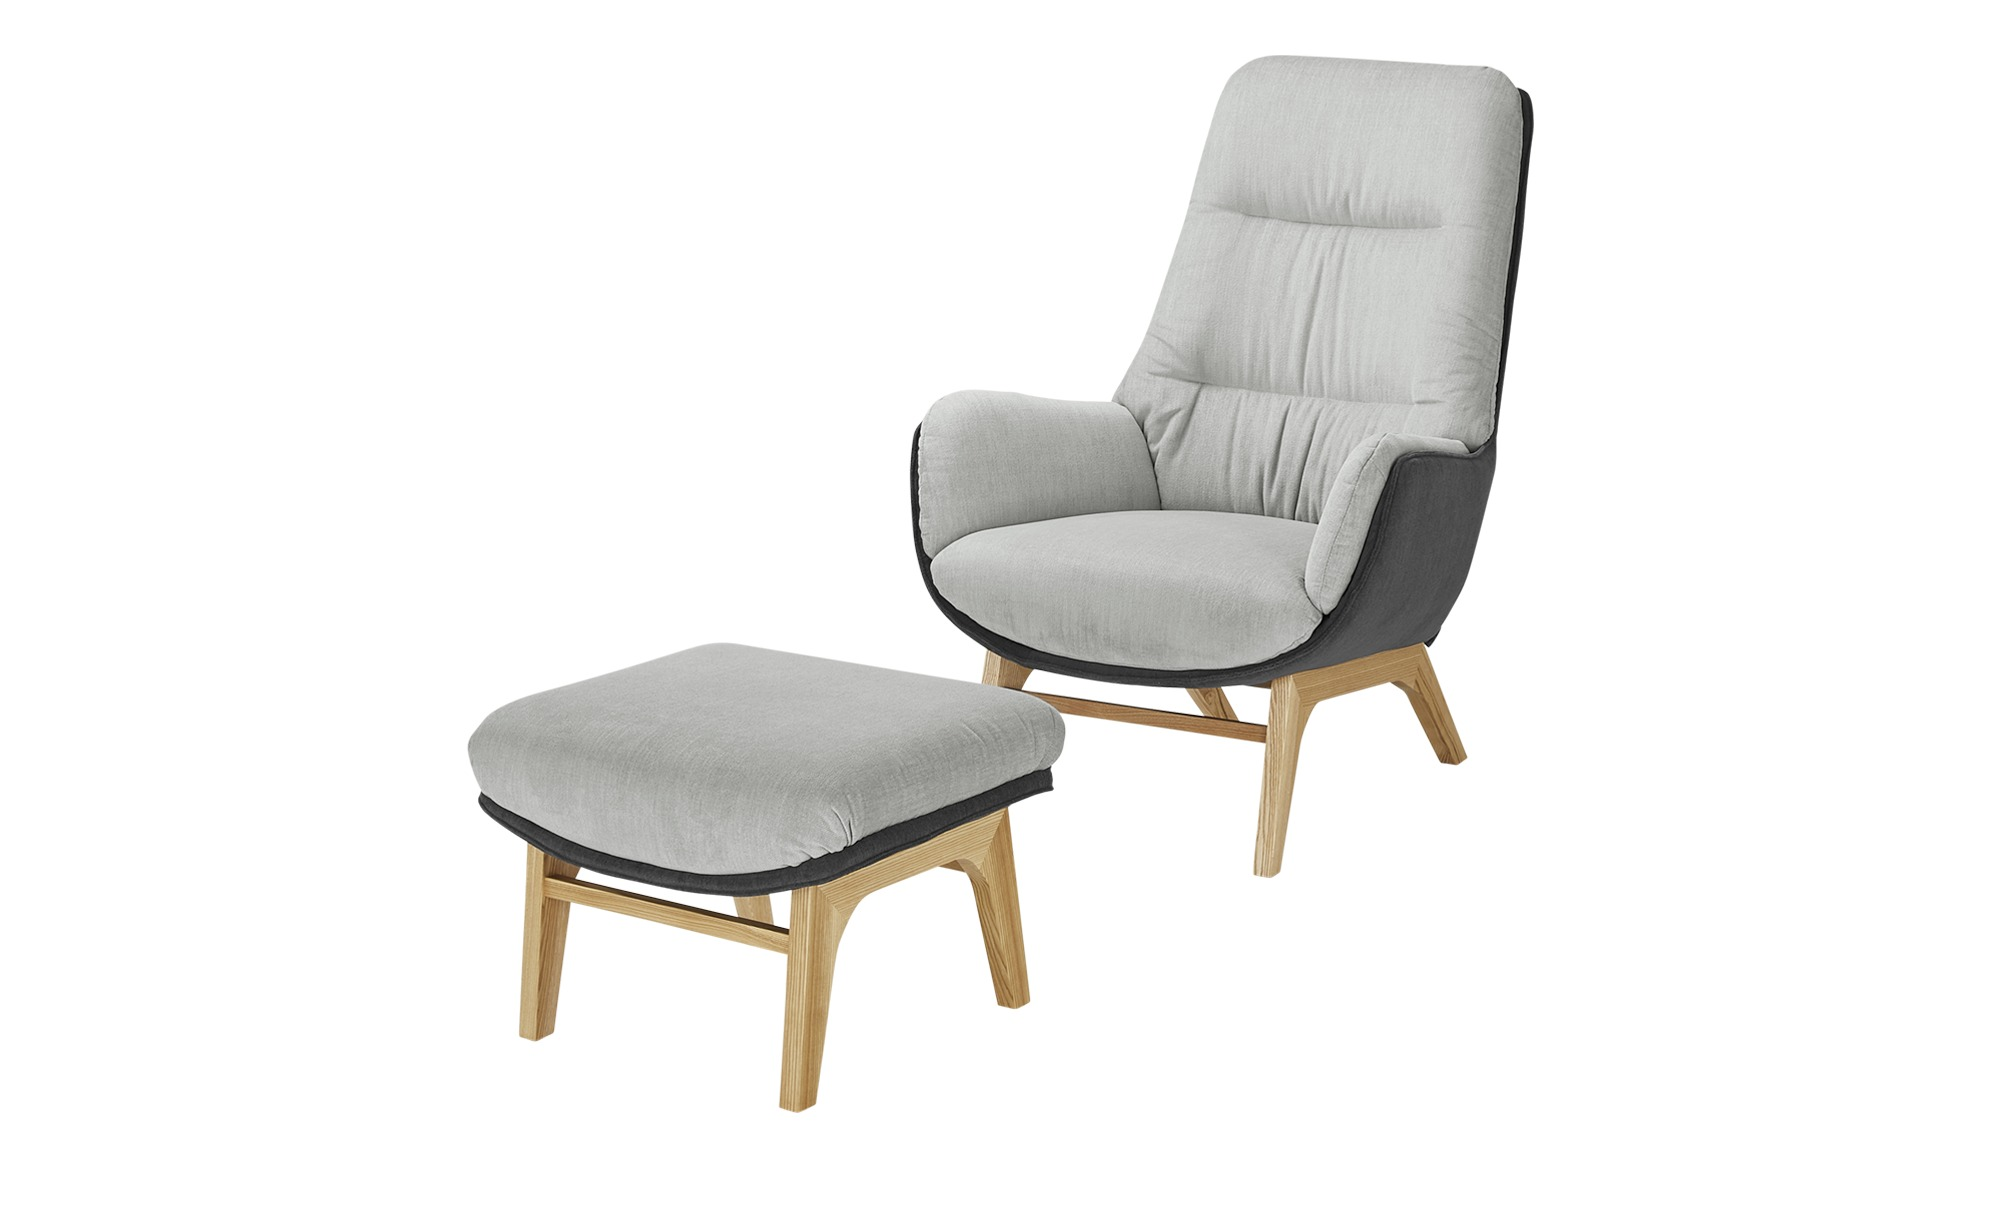 Gray & Jones Hochlehnsessel  Cap Ferrat Homi ¦ grau ¦ Maße (cm): B: 82 H: 108 T: 90 Polstermöbel > Sessel > Polstersessel - Höffner